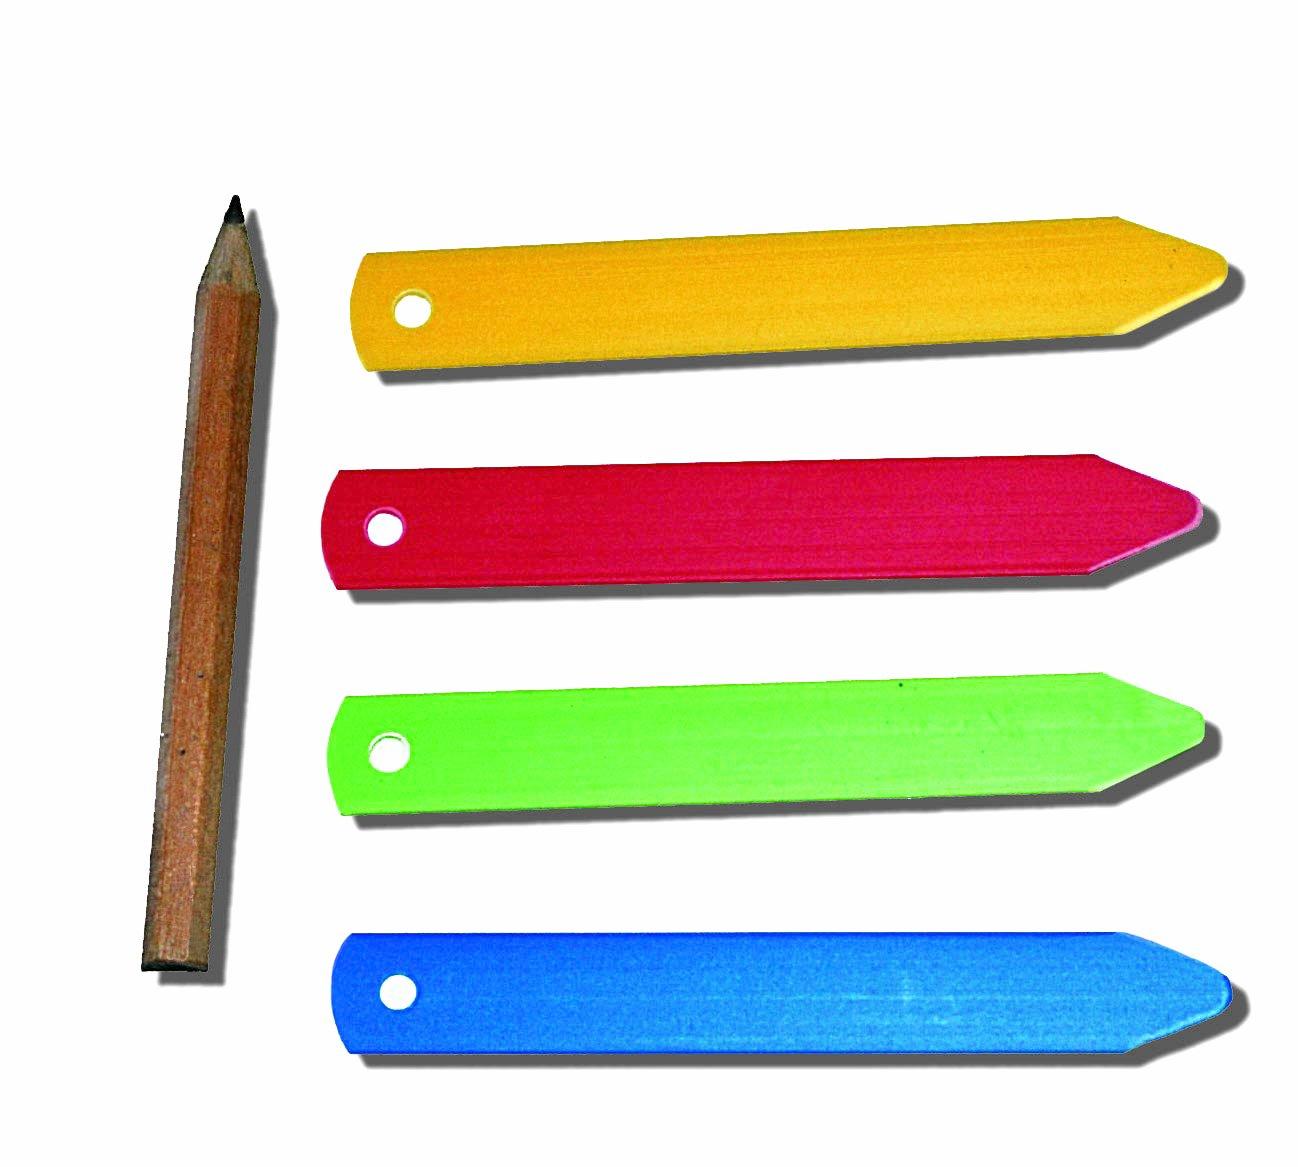 Tildenet 100mm/ 4-inch Plastic Plant Labels with Pencil - Multi-Color Tildenet Gardenware